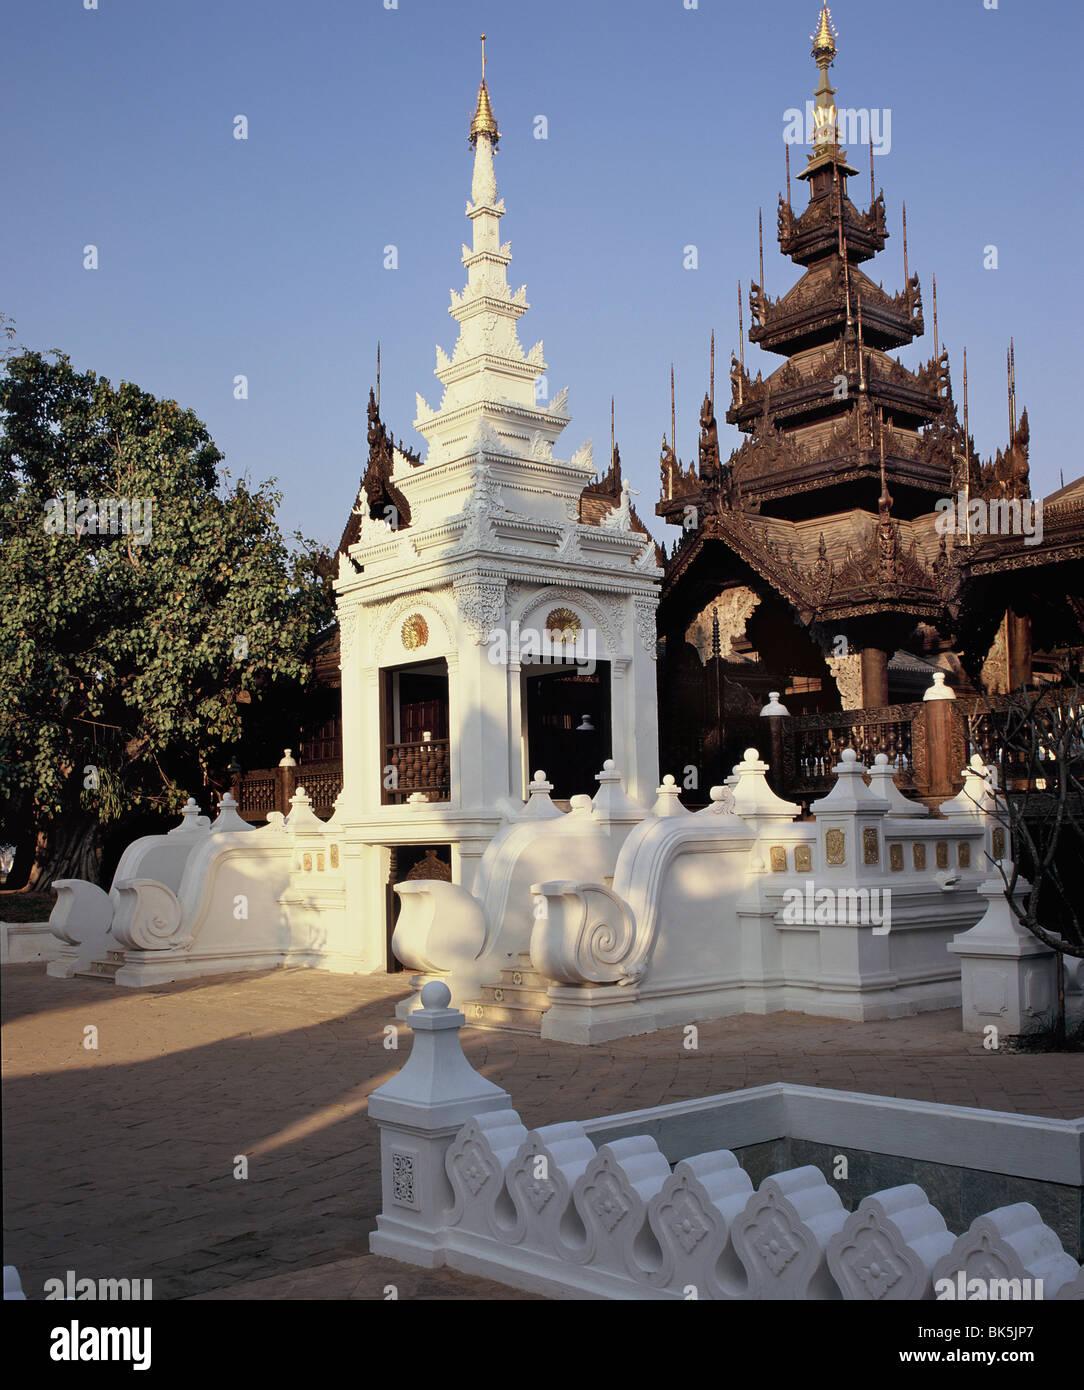 The Dheva Spa at the Mandarin Oriental Dhara Dhevi, Chiang Mai, Thailand, Southeast Asia, Asia - Stock Image